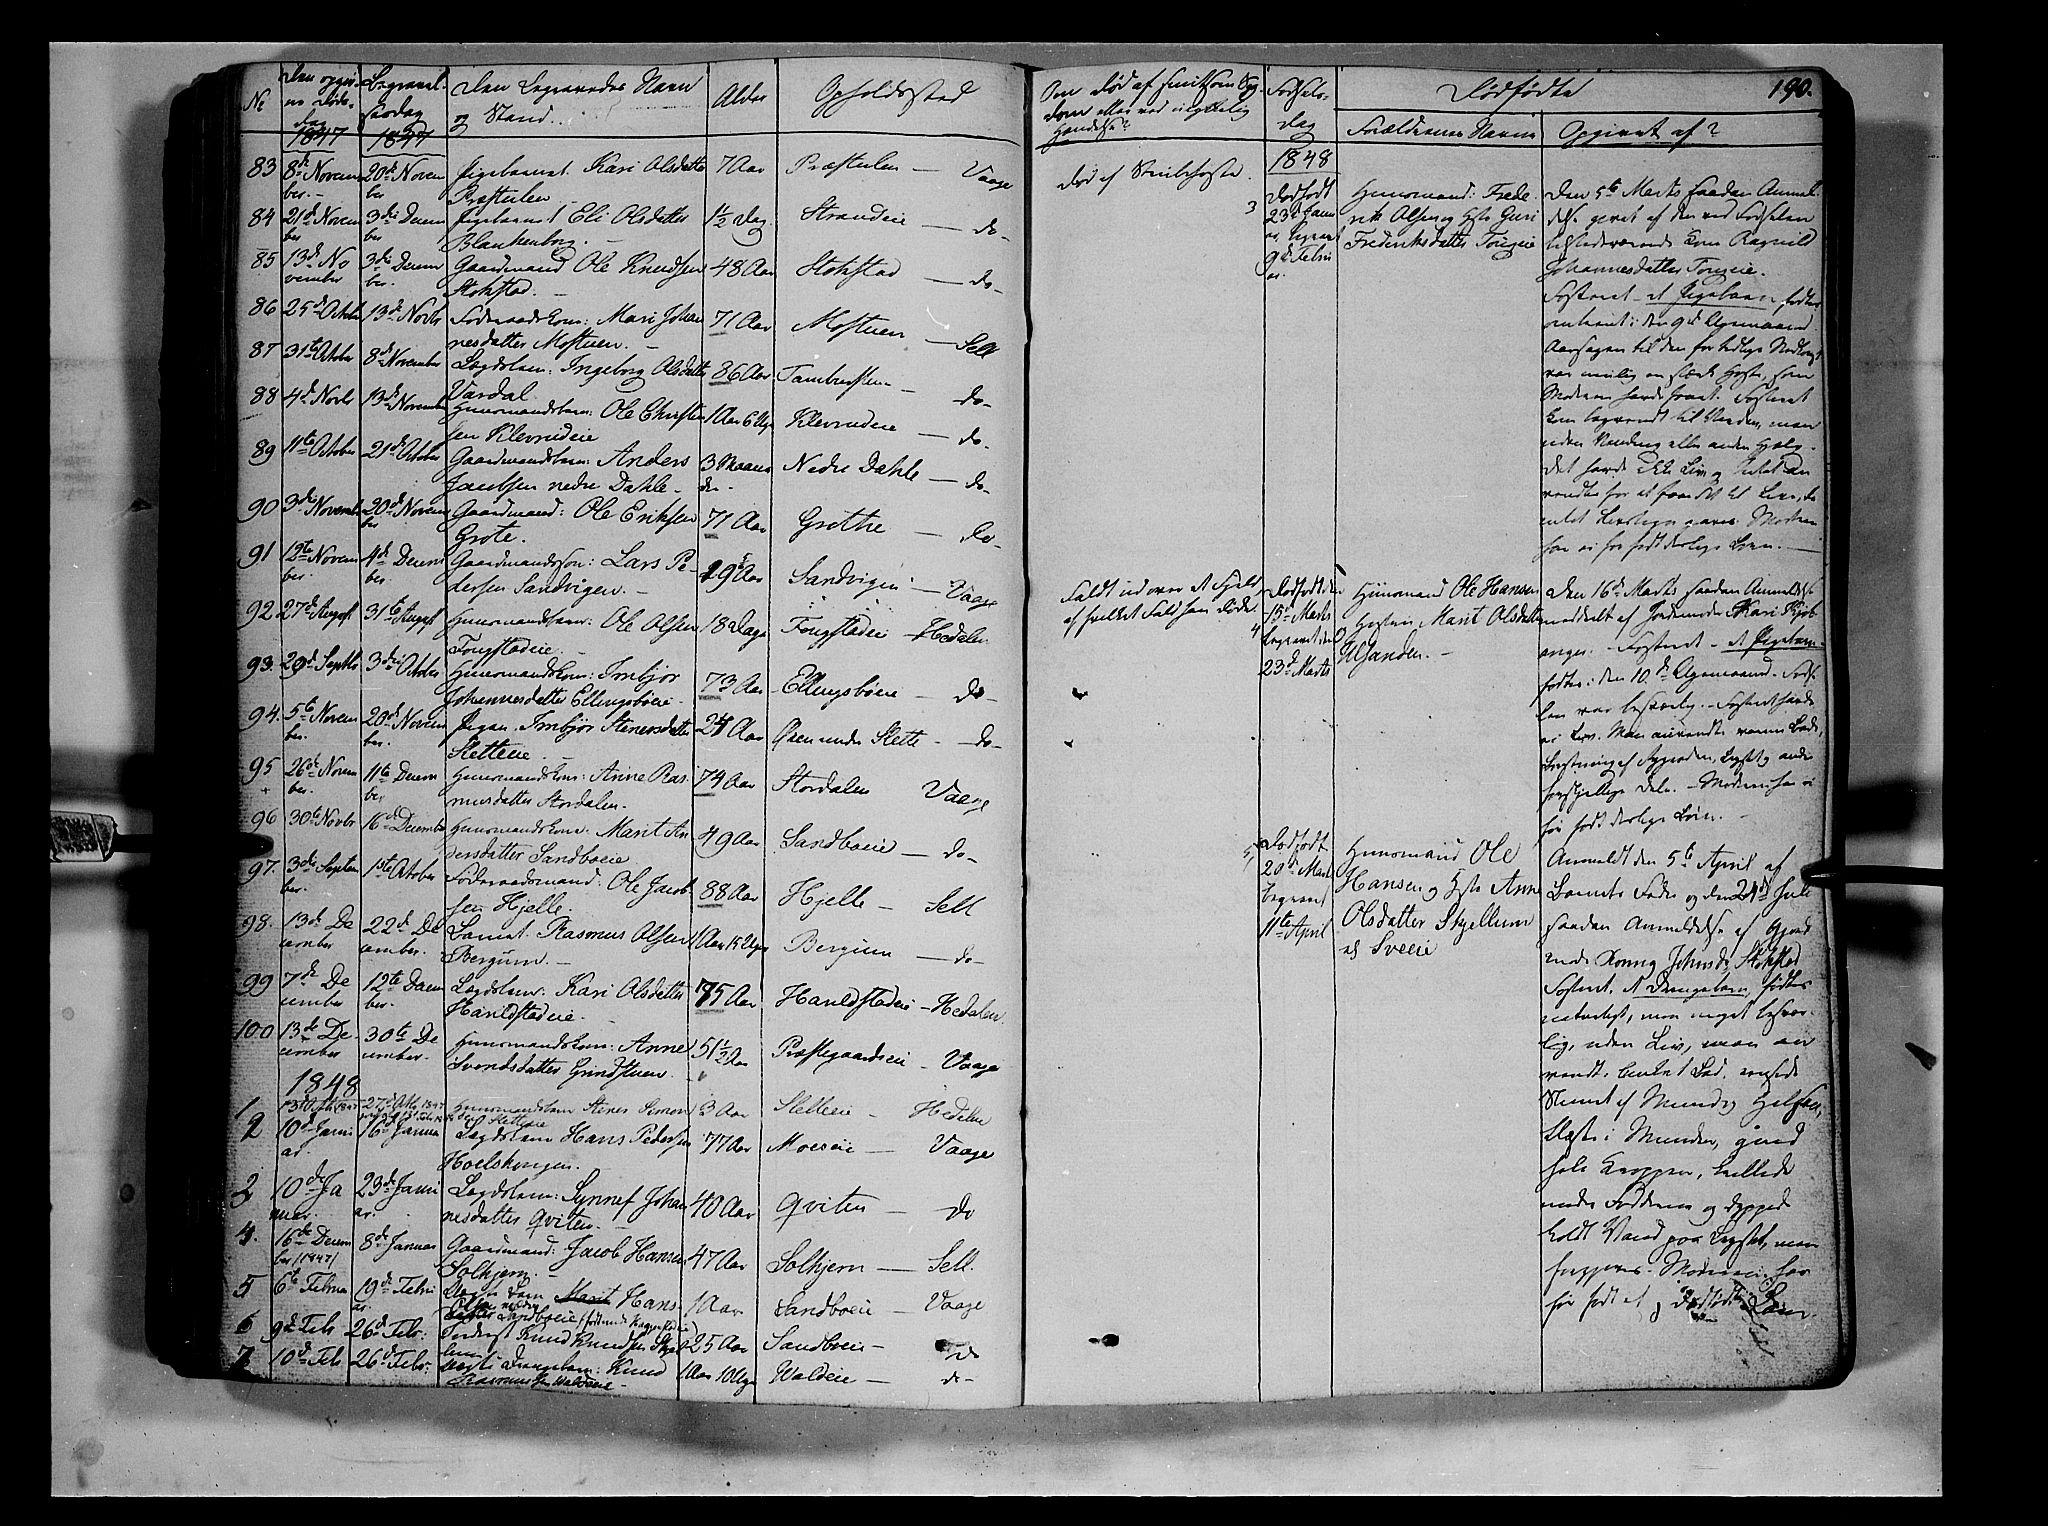 SAH, Vågå prestekontor, Ministerialbok nr. 5 /1, 1842-1856, s. 190